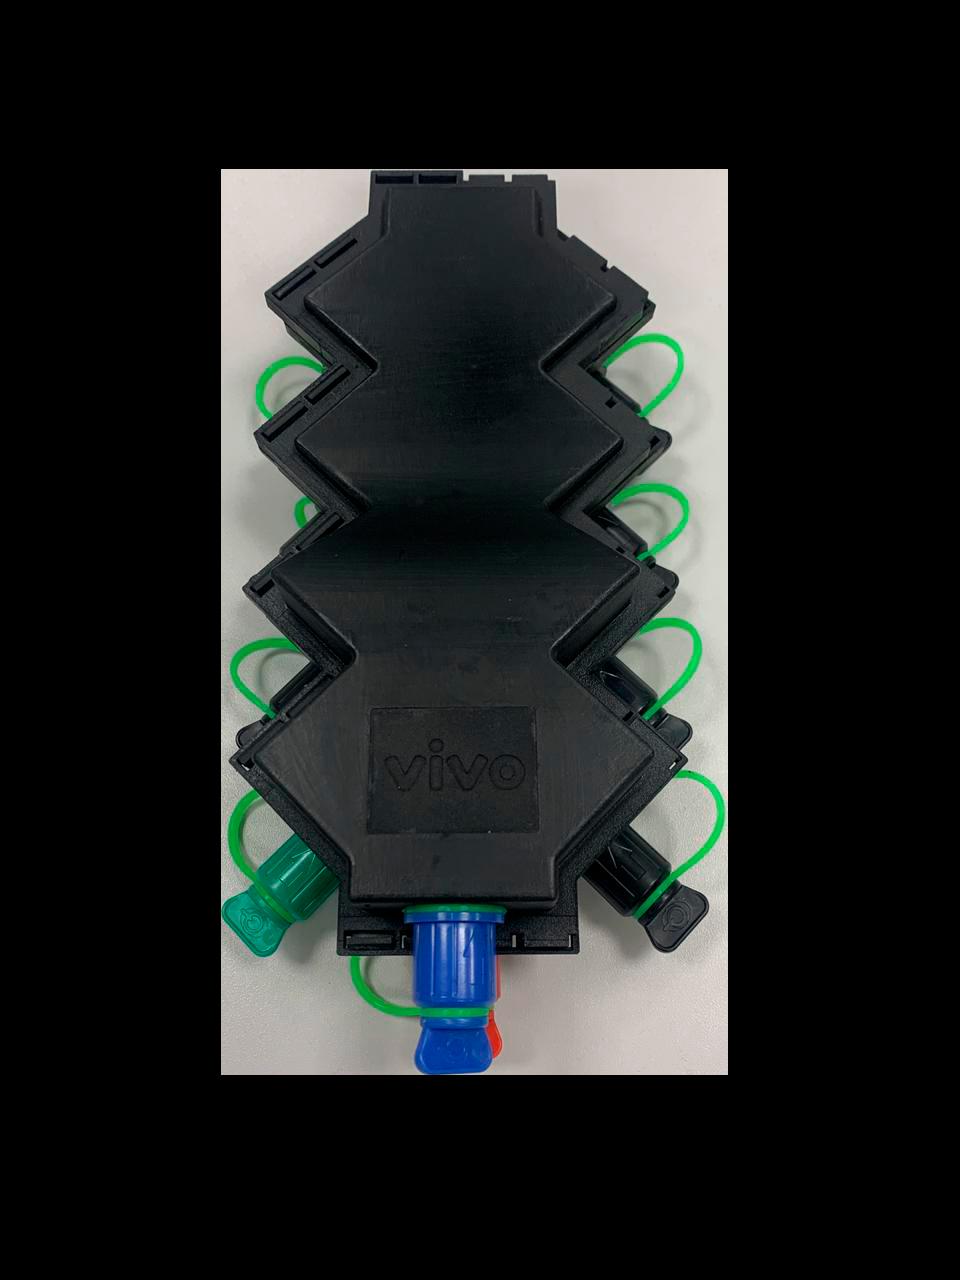 Caixa de Distribuição Óptica Externa Pré Conectorizada Selada - CDOE-PS